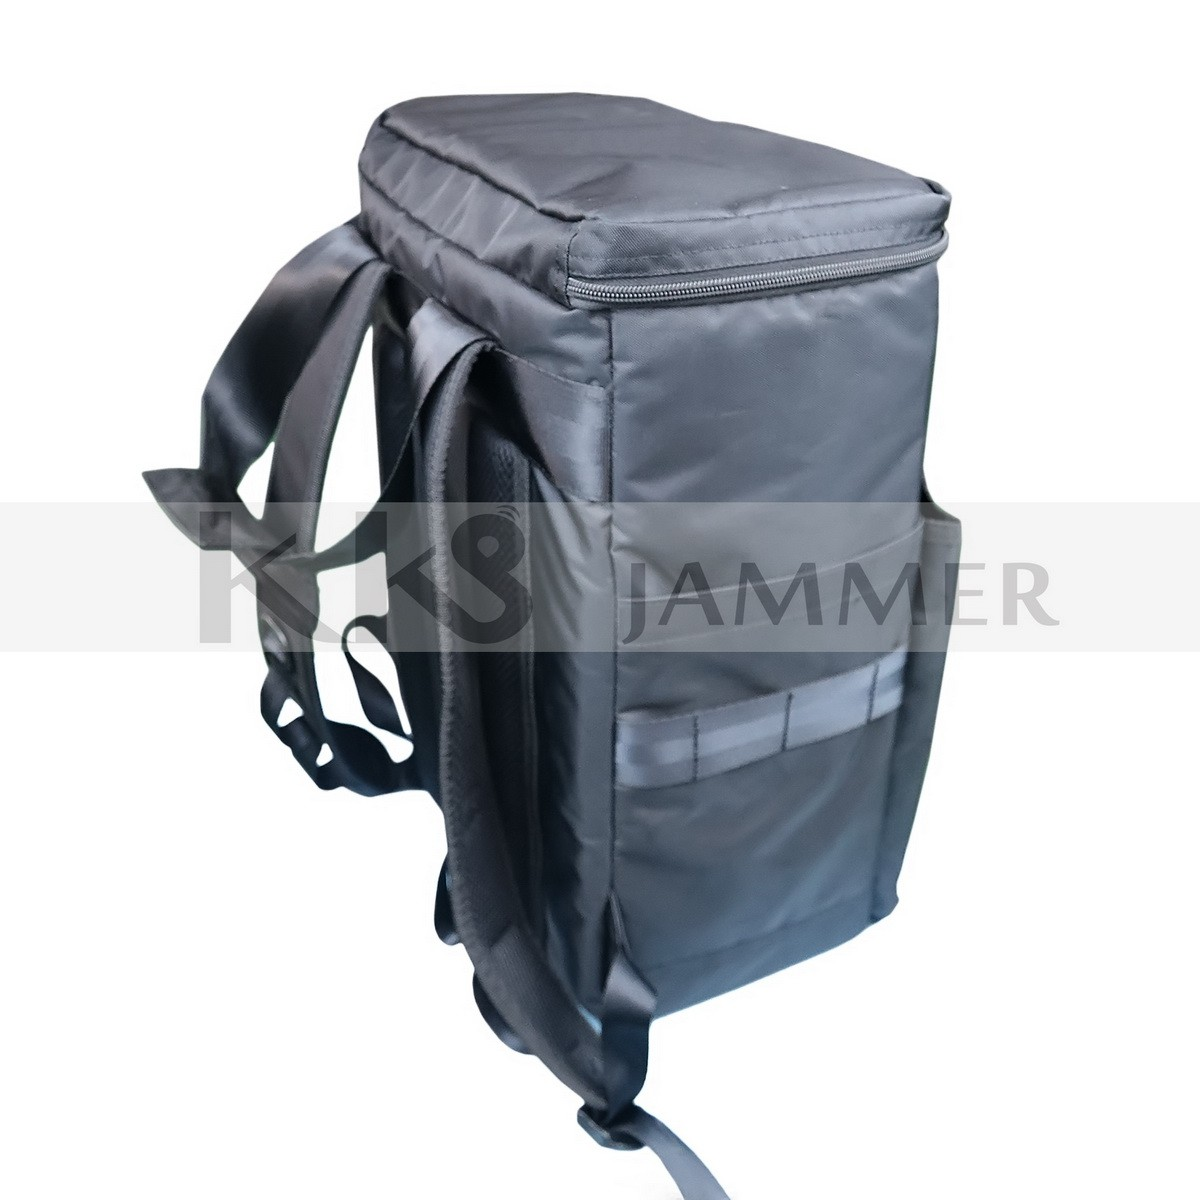 Manpack Drone Jammer